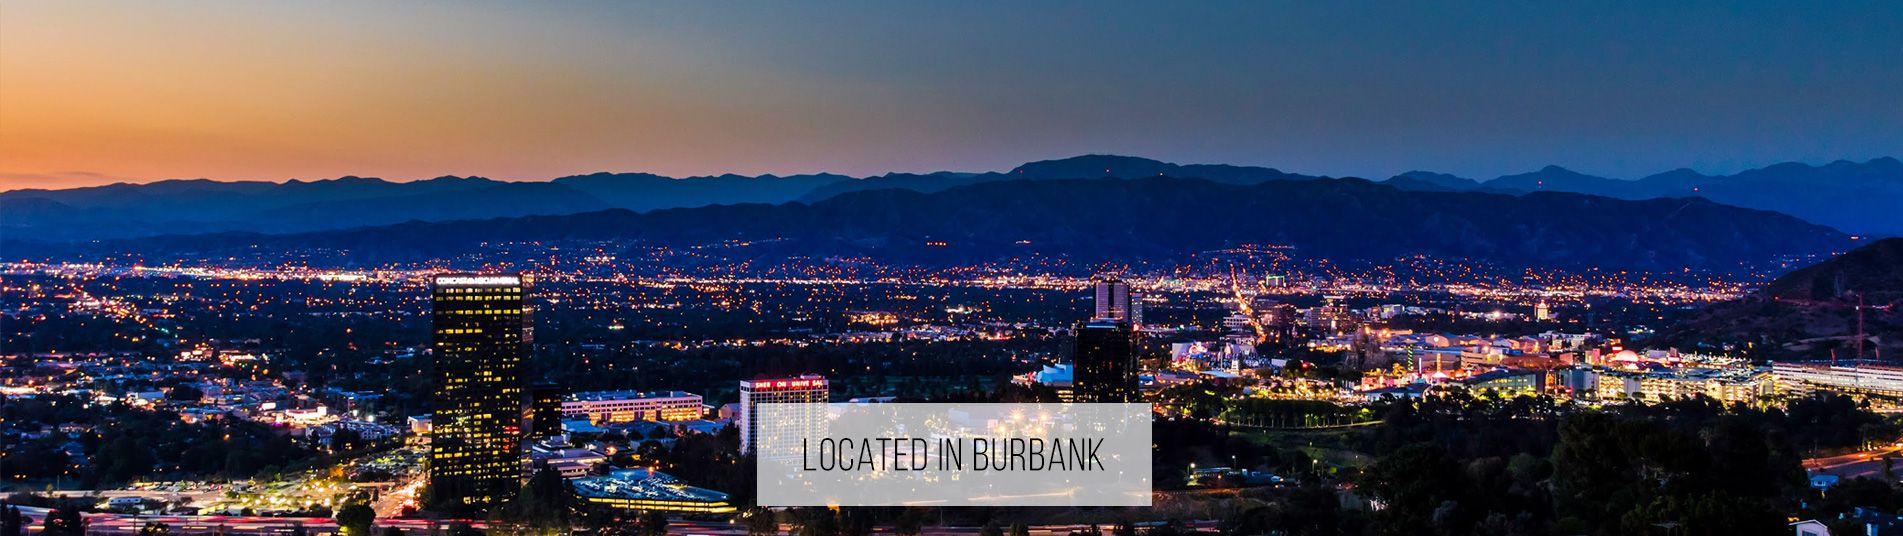 located-in-burbank